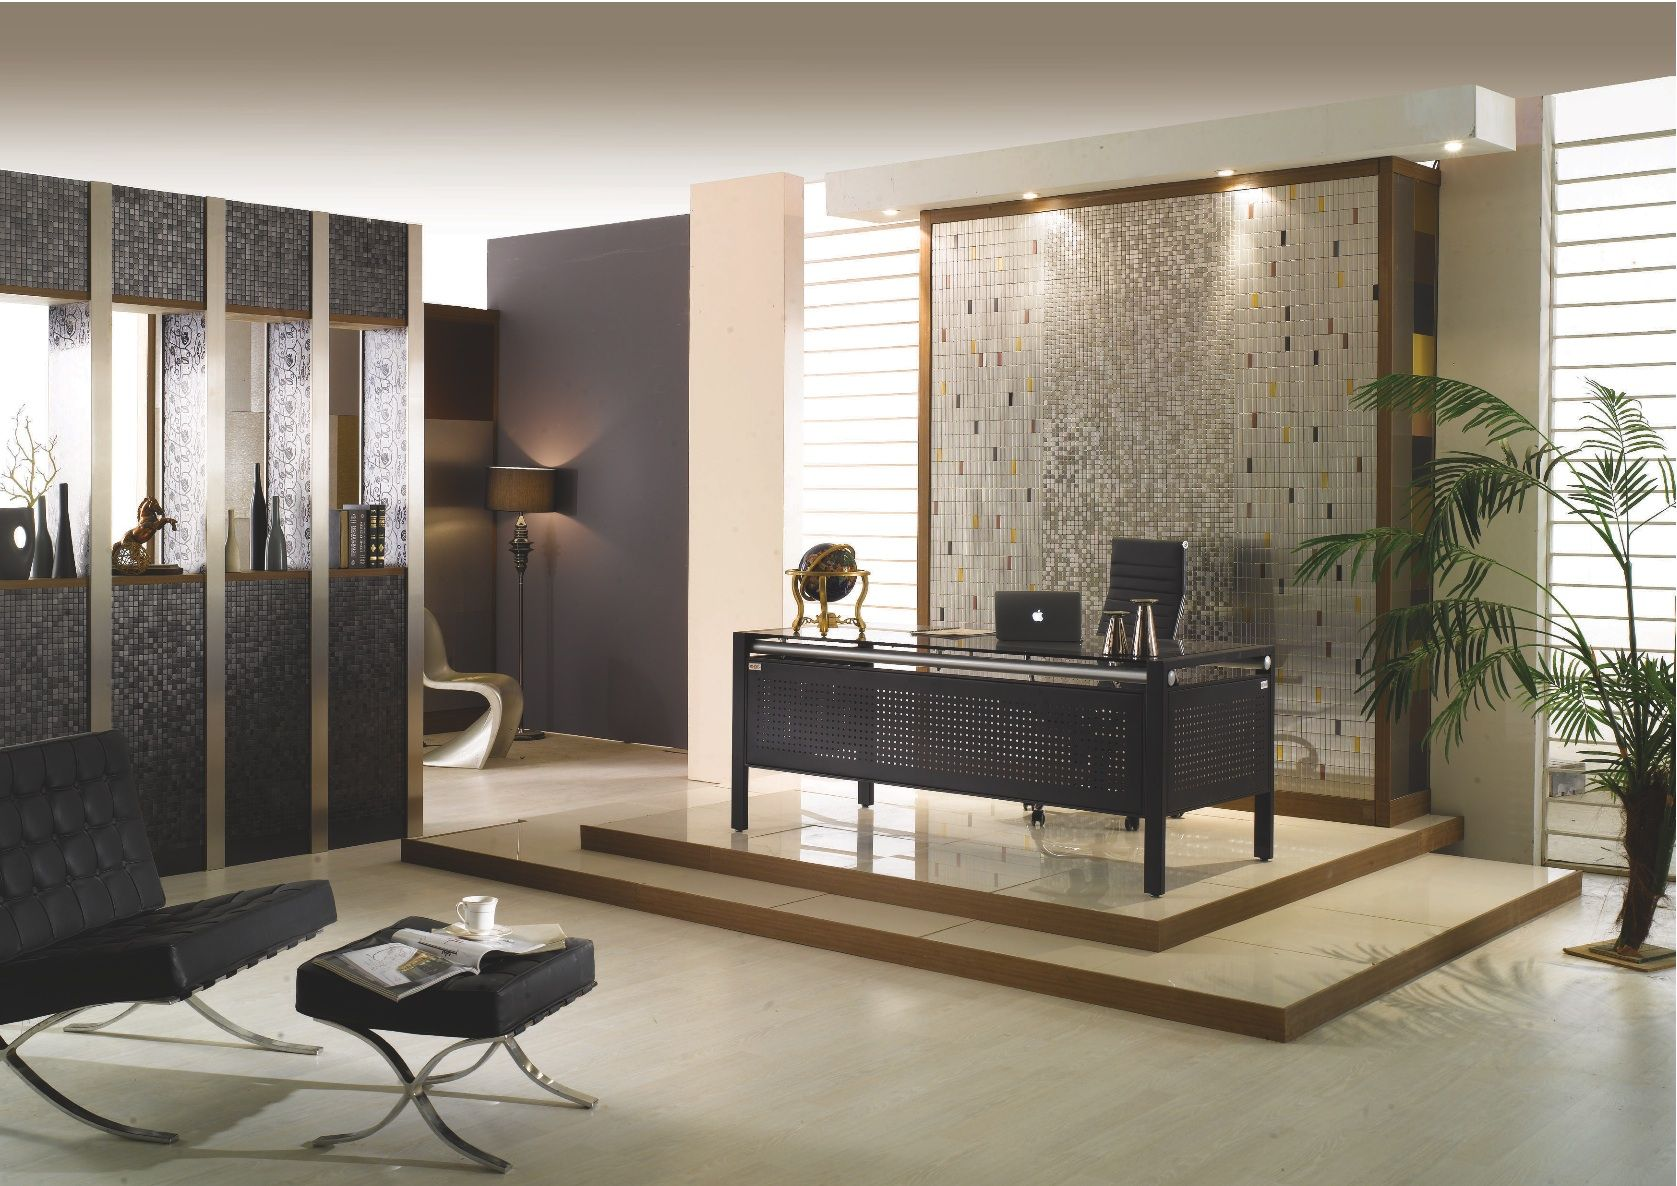 Stainless Steel Premium Mosaic Architectural Pinterest Buy